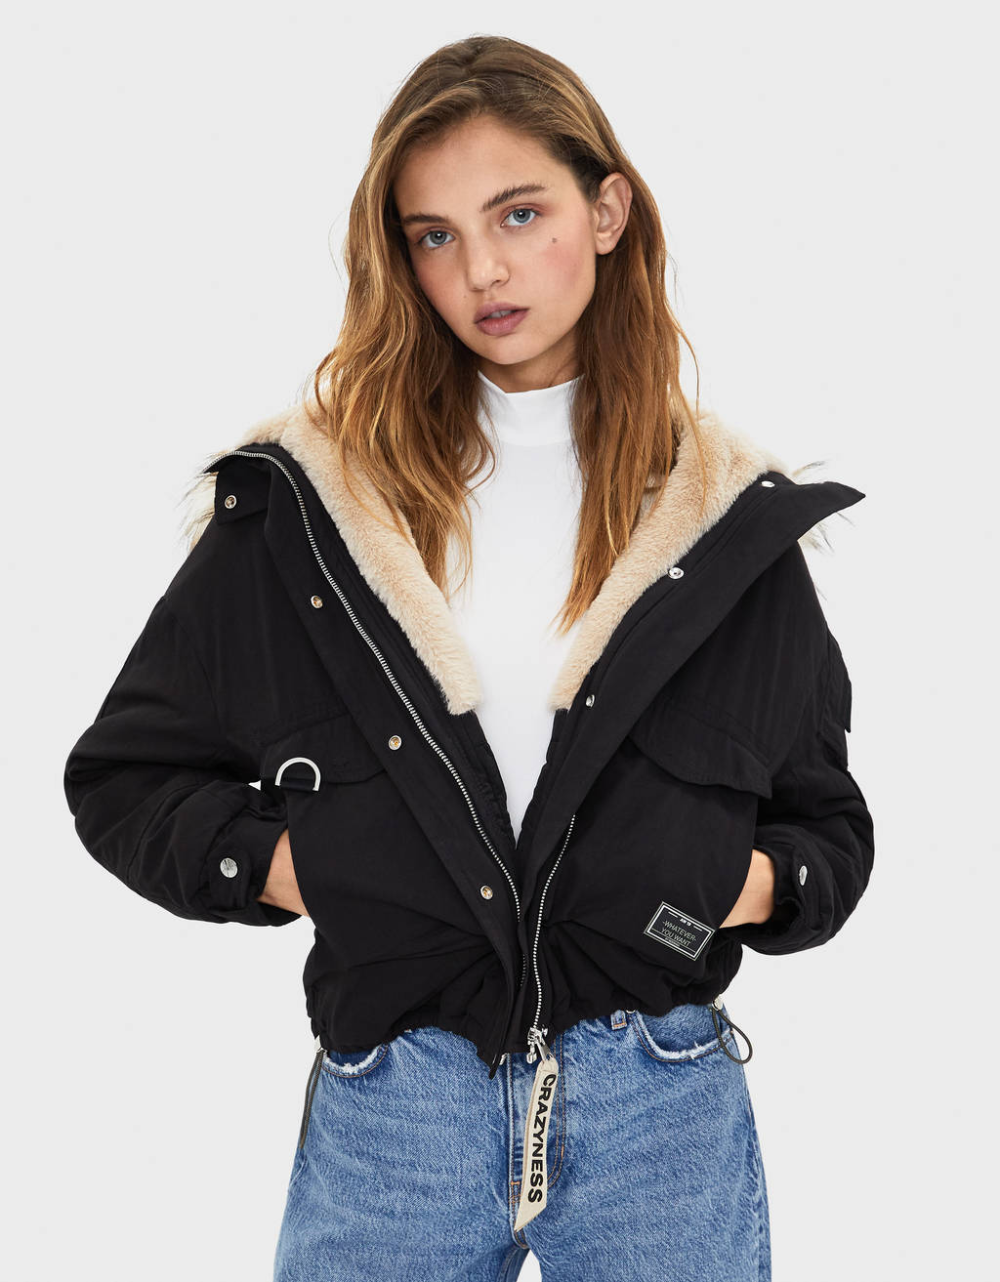 Cropped Parka With Faux Fur Hood Trim Jackets Coats Bershka United Kingdom Faux Fur Hood Trim Womens Fashion Jackets Fashion [ 1282 x 1000 Pixel ]